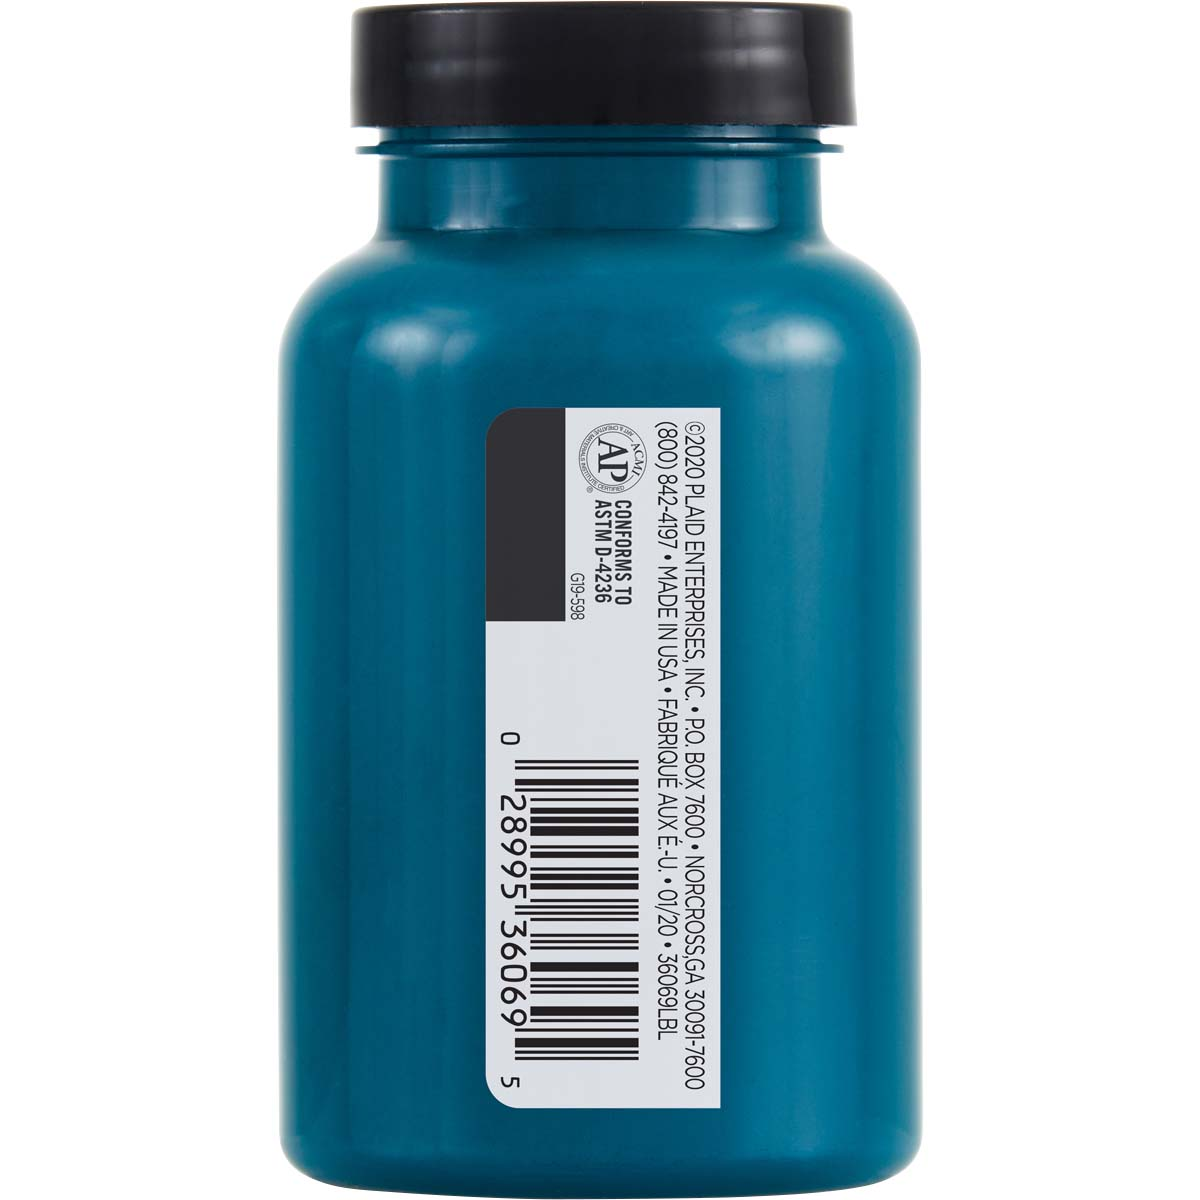 FolkArt ® One Décor Paint™ - Deep Atlantic Blue, 8 oz. - 36069